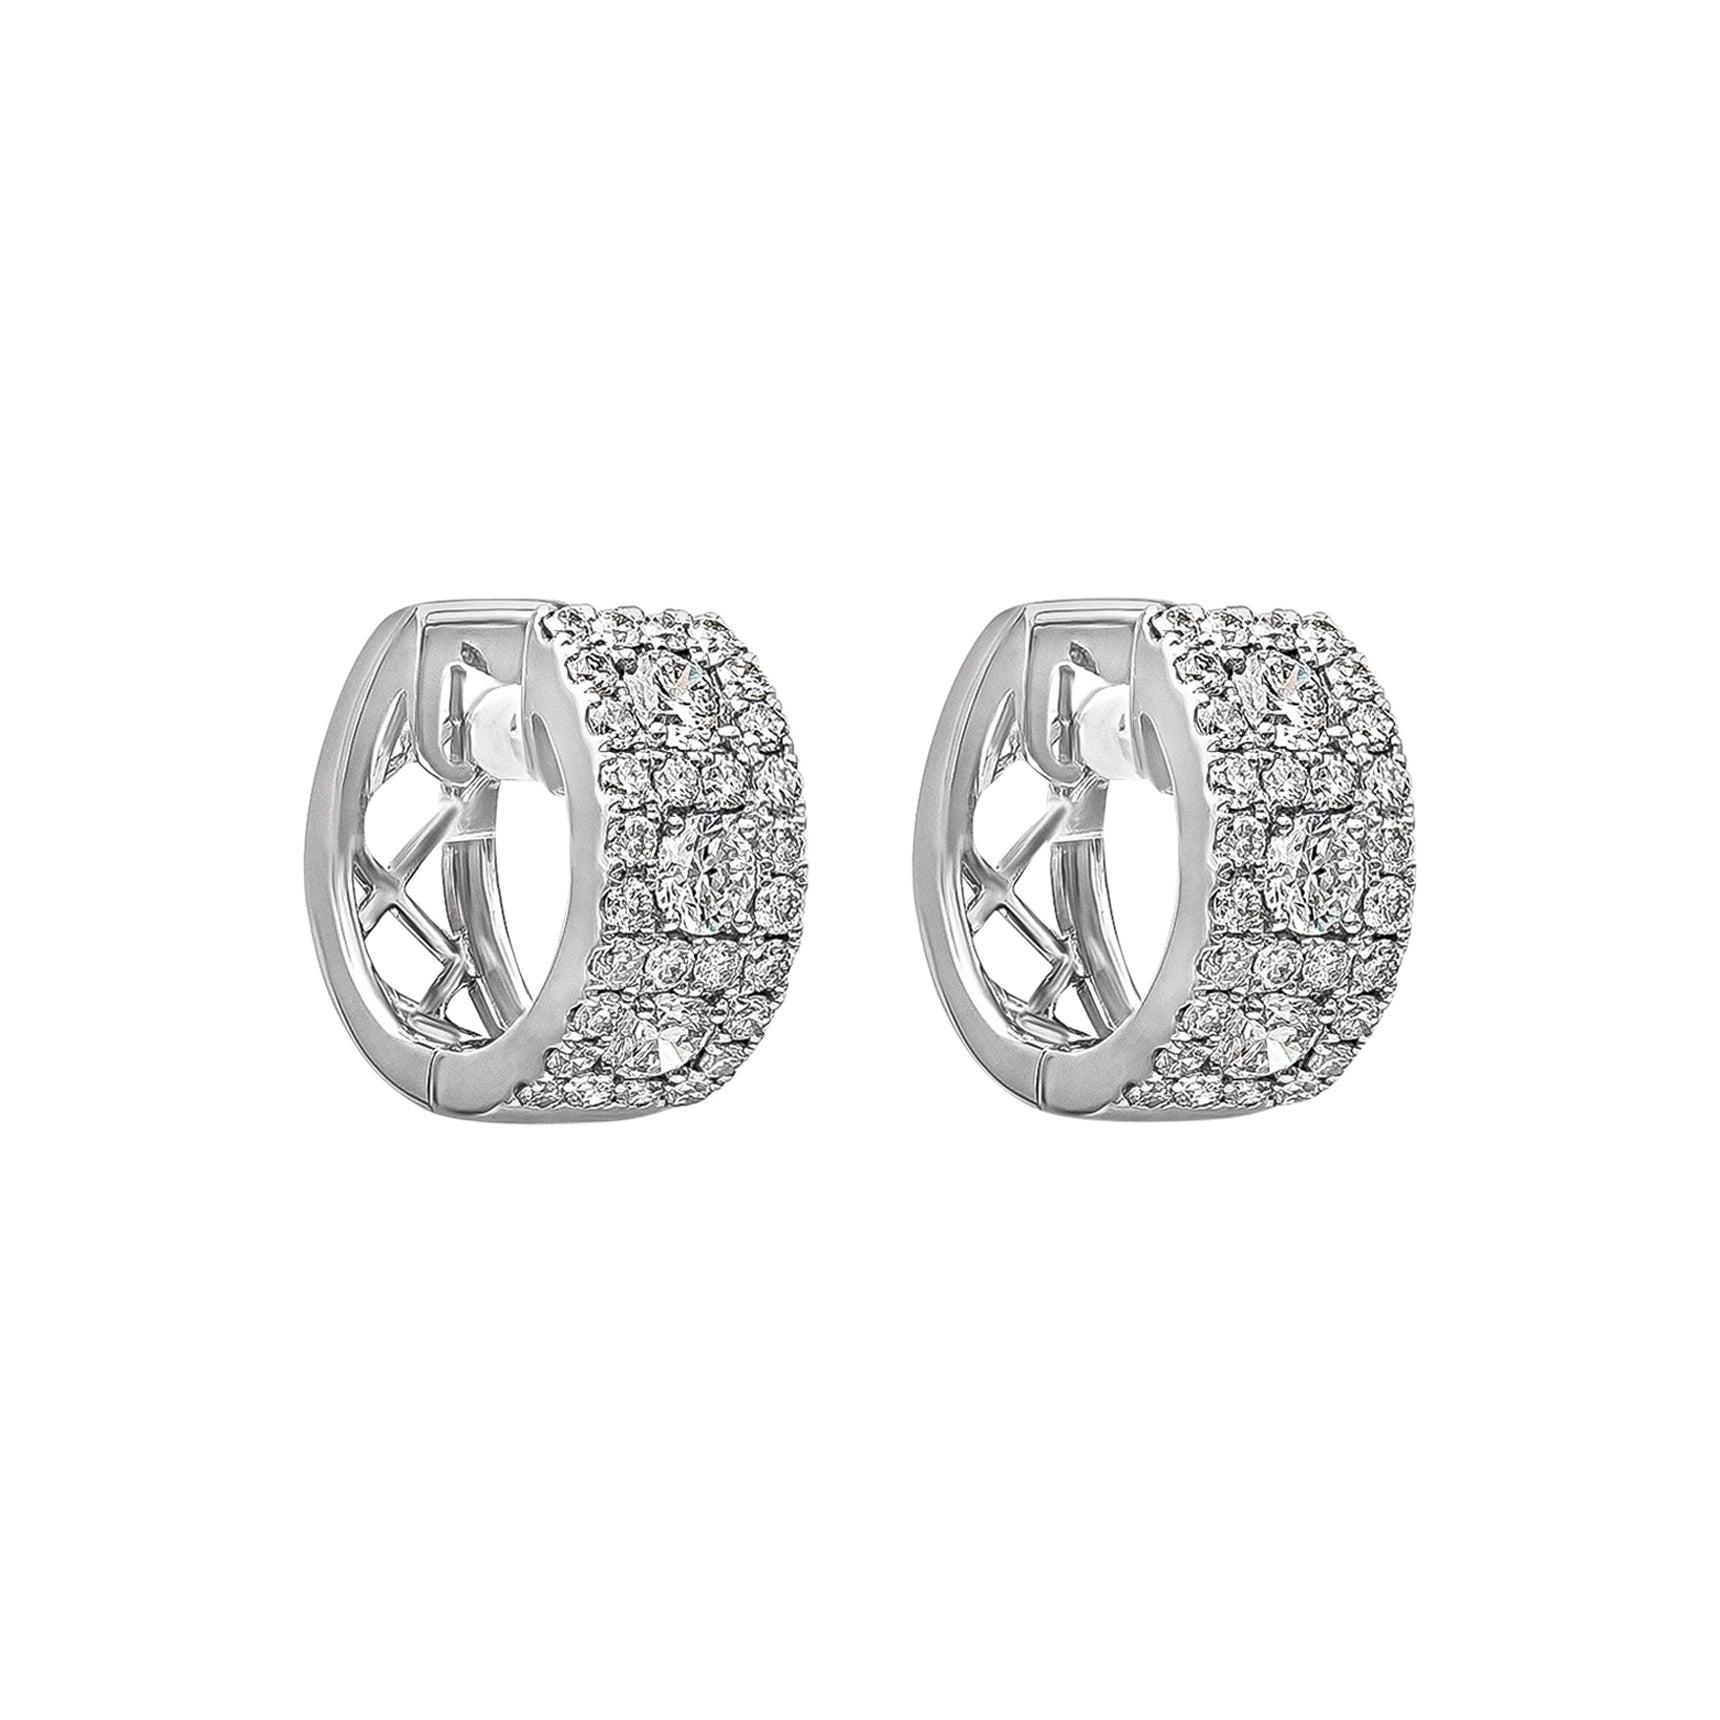 Roman Malakov 1.15 Carat Round Diamond Huggie Hoop Earrings